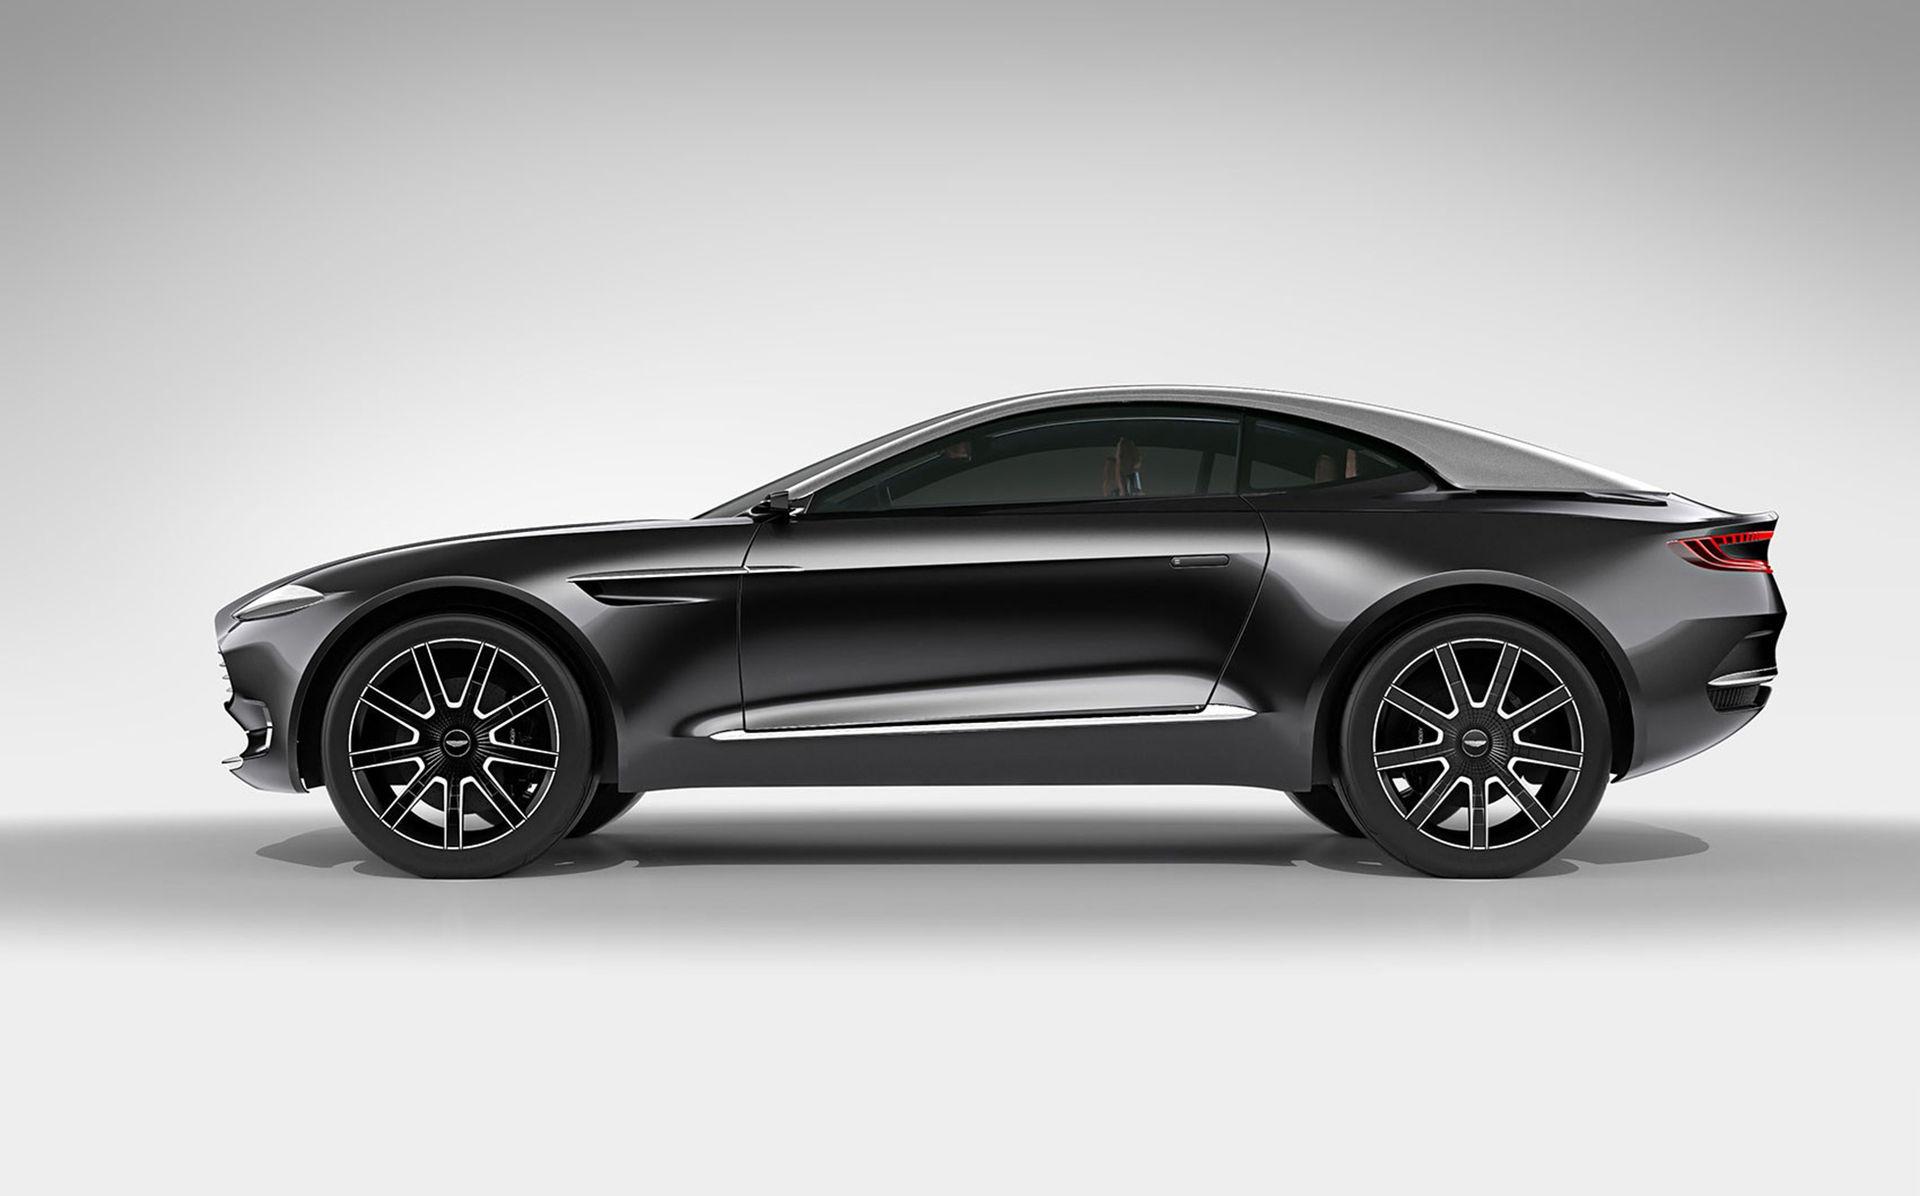 Aston Martins SUV kan få namnet Varekai